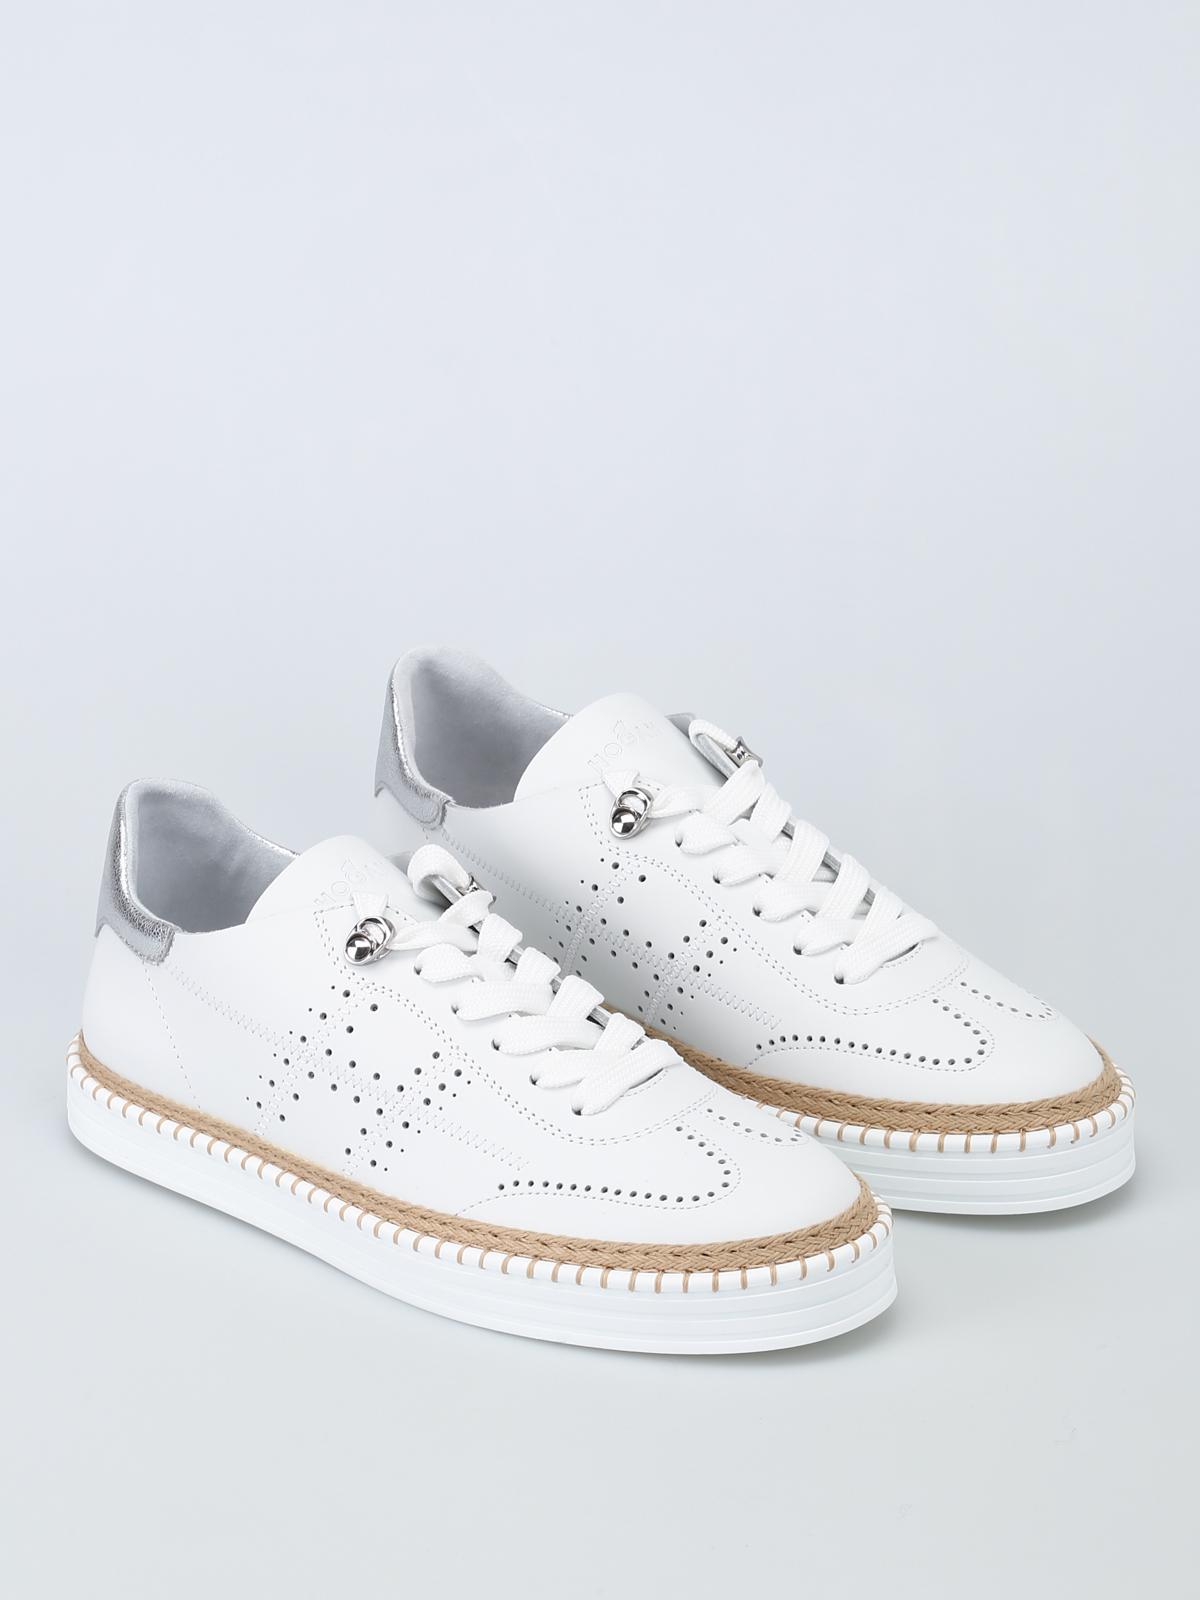 Hogan - Sneaker R260 bianche in pelle - sneakers - HXW2600AD30IGG0351 5526ebb4a2f